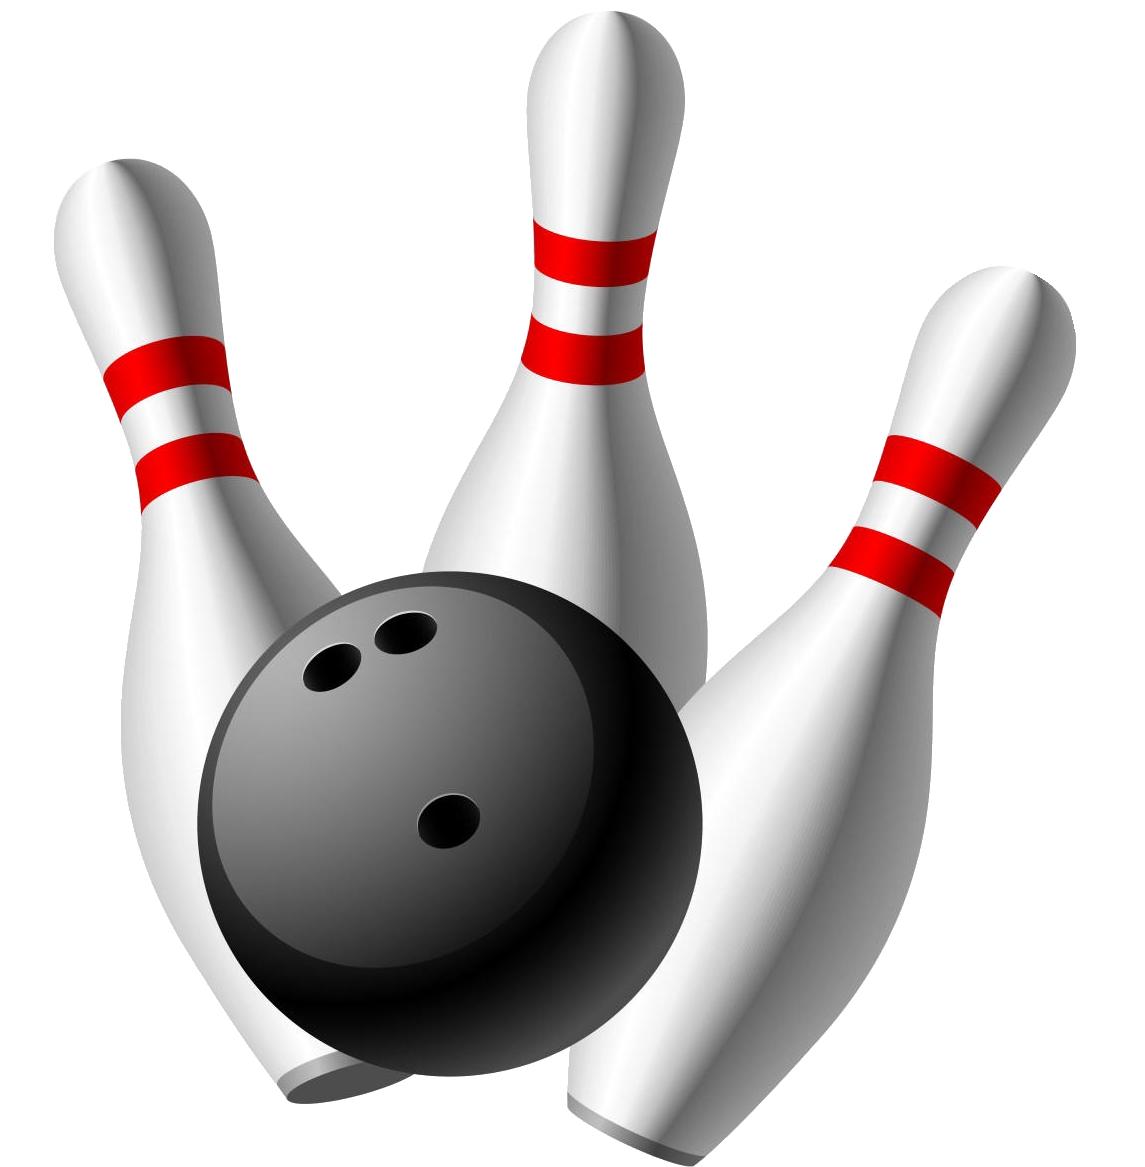 Pin clipart pumpkin bowling, Pin pumpkin bowling Transparent.